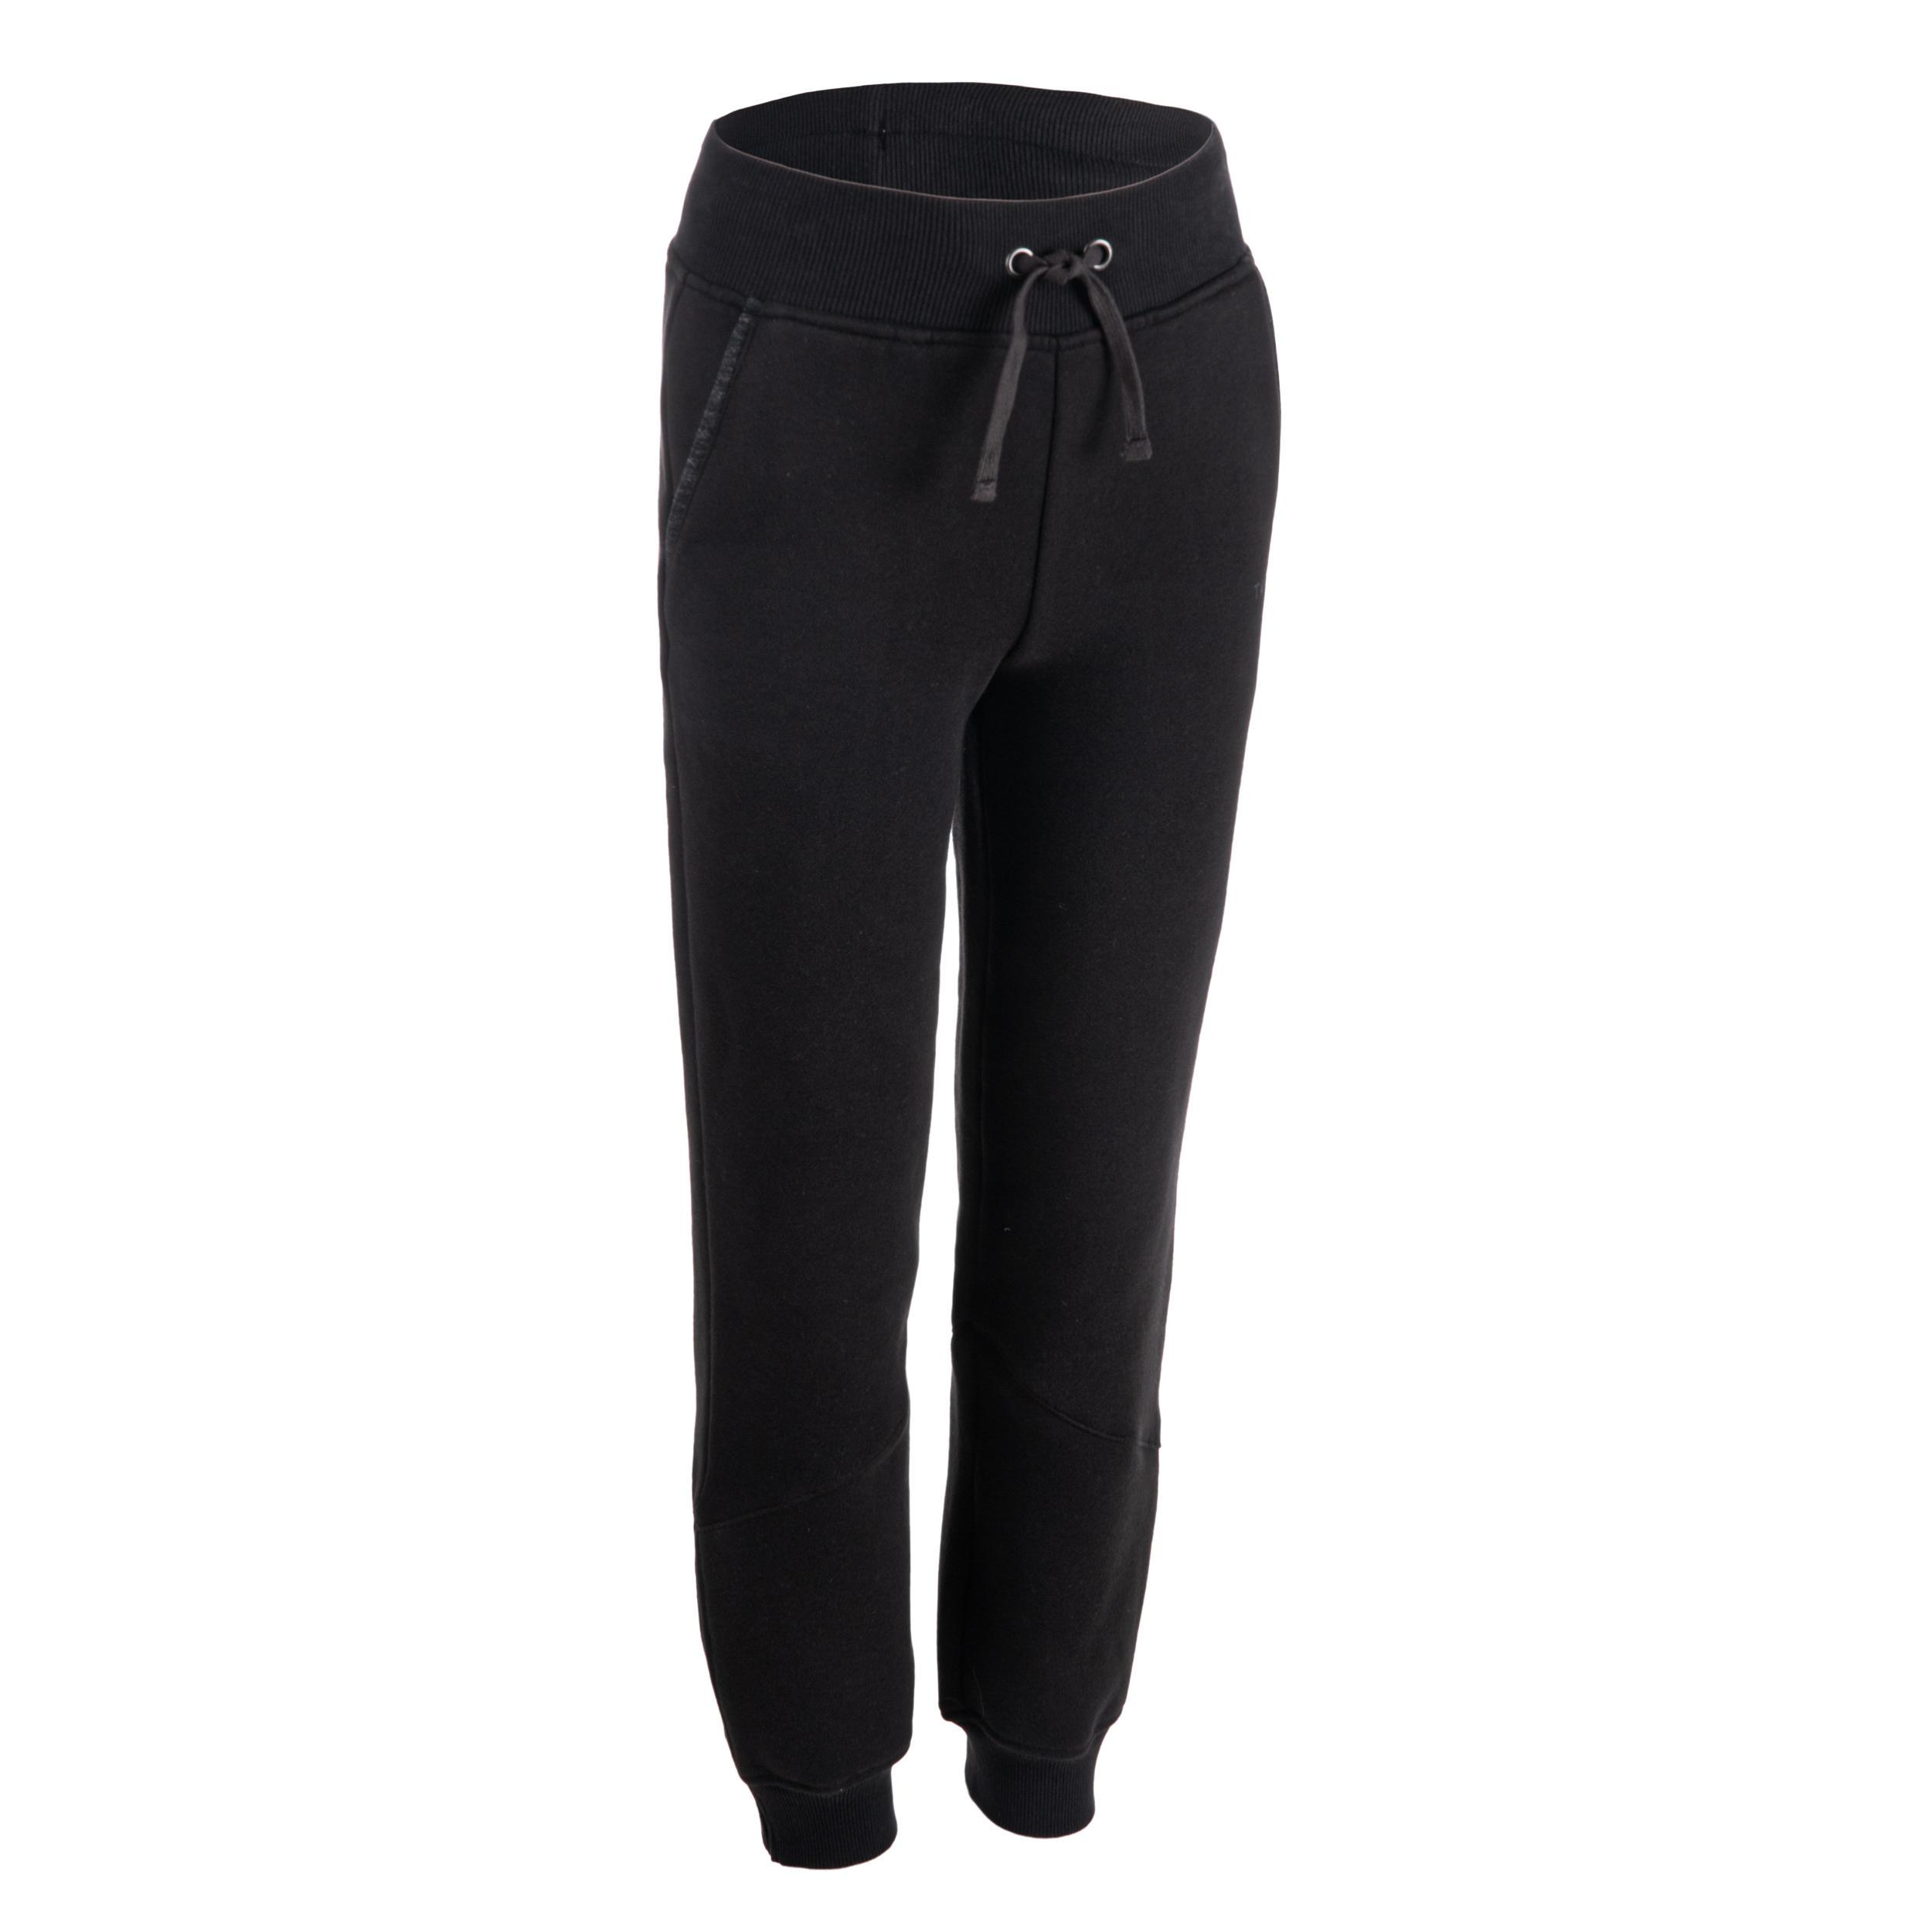 Pantalon Baschet P500 Copii la Reducere poza